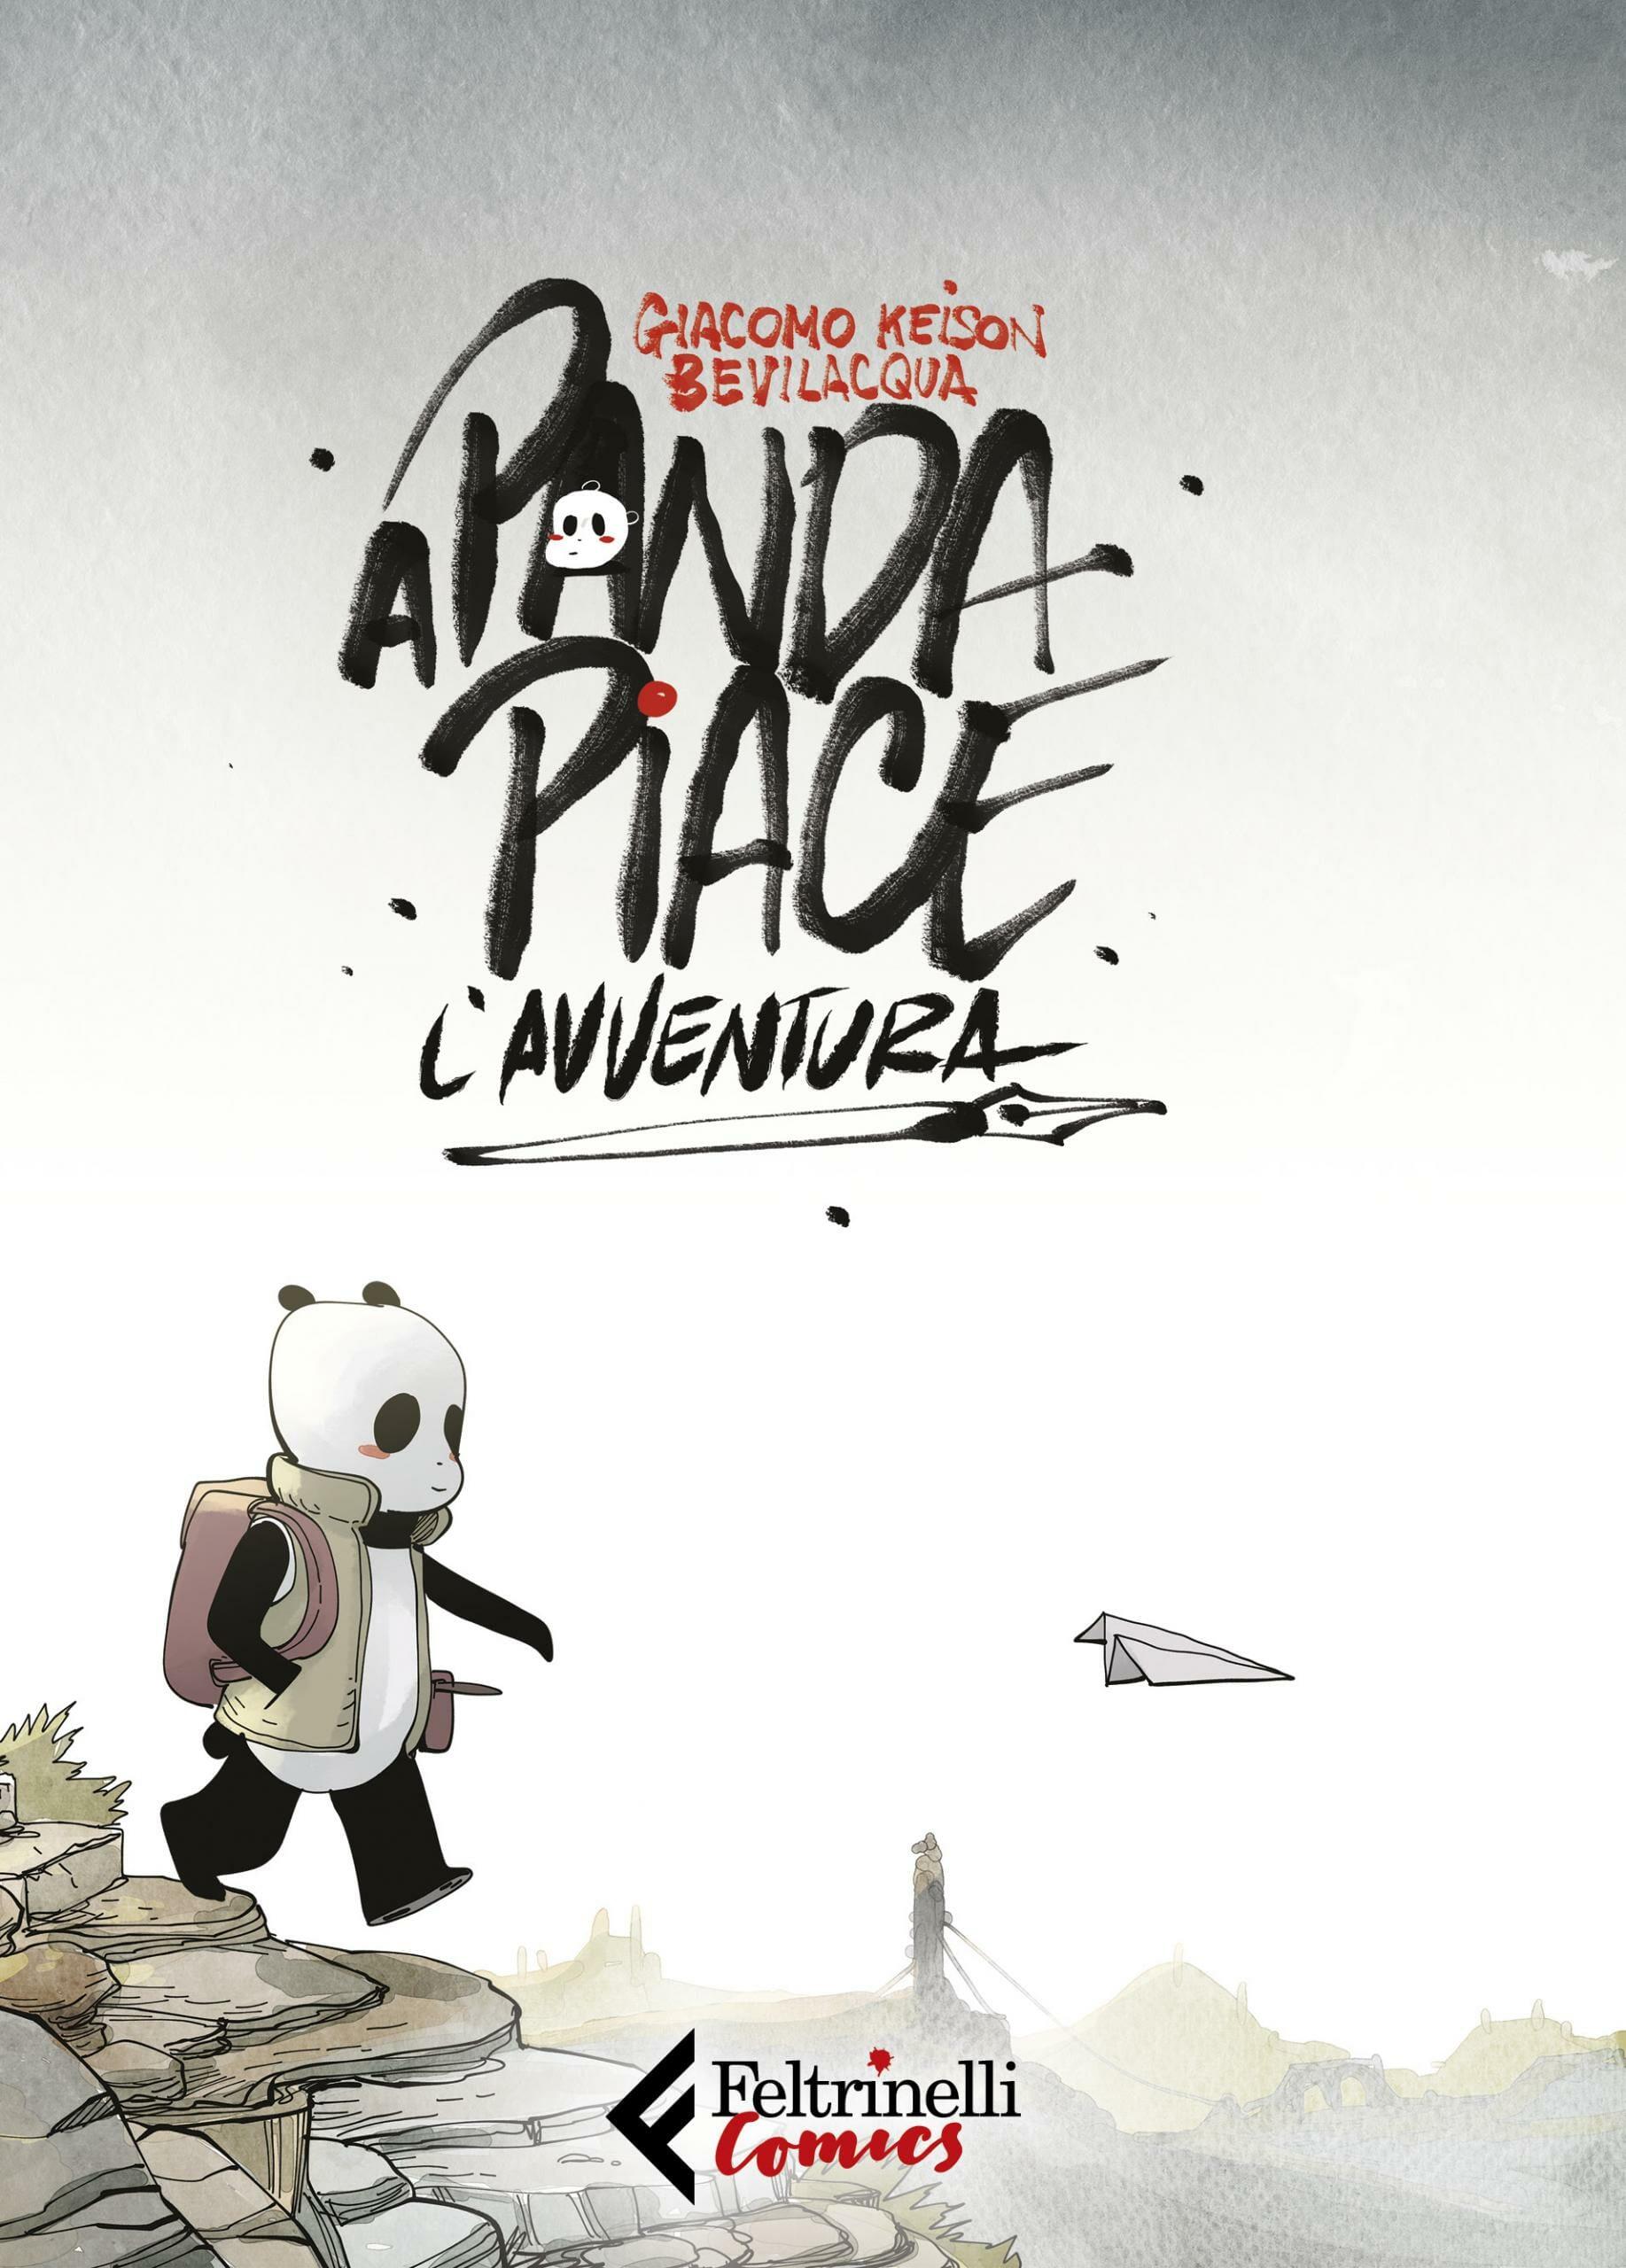 Fumetti da leggere a panda piace